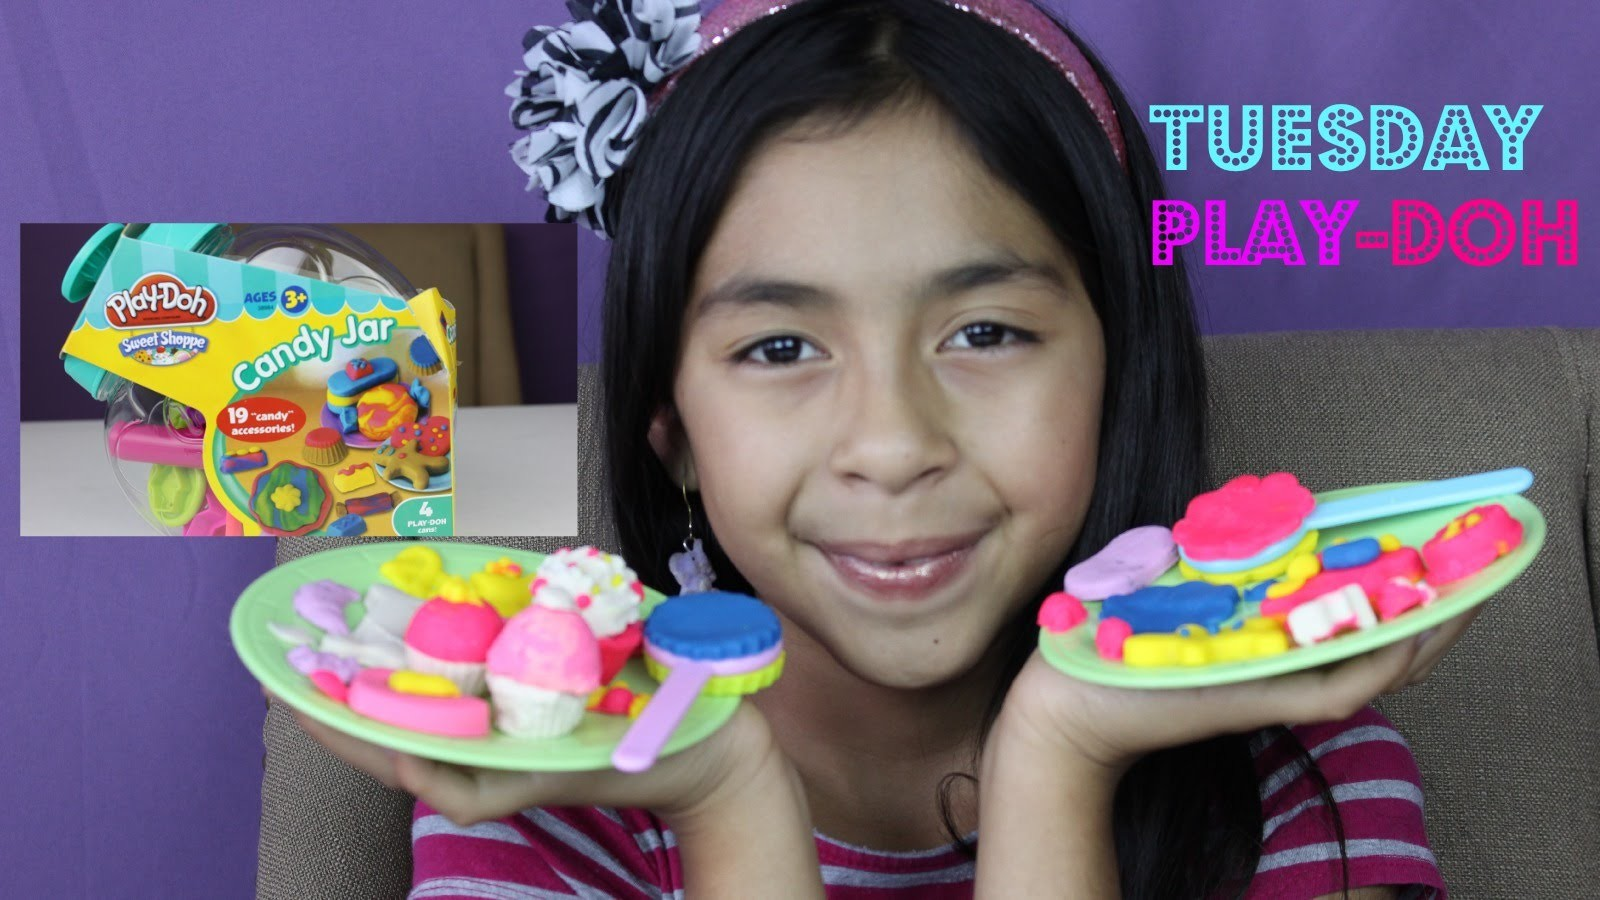 PLAY DOH Candy Jar,Make Cupcakes, Ice Cream, Lollipops-Tuesday Play Doh|B2cutecupcakes